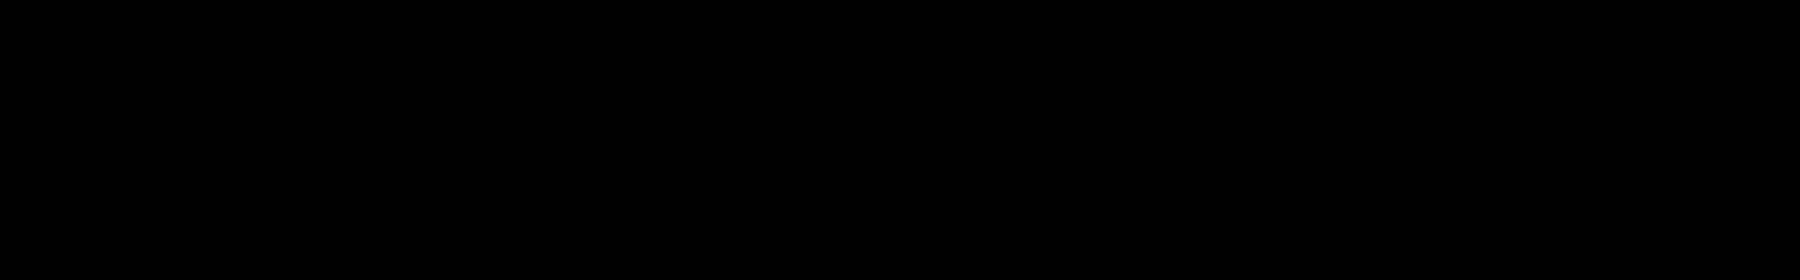 Ultimate DnB 2: Loops audio waveform